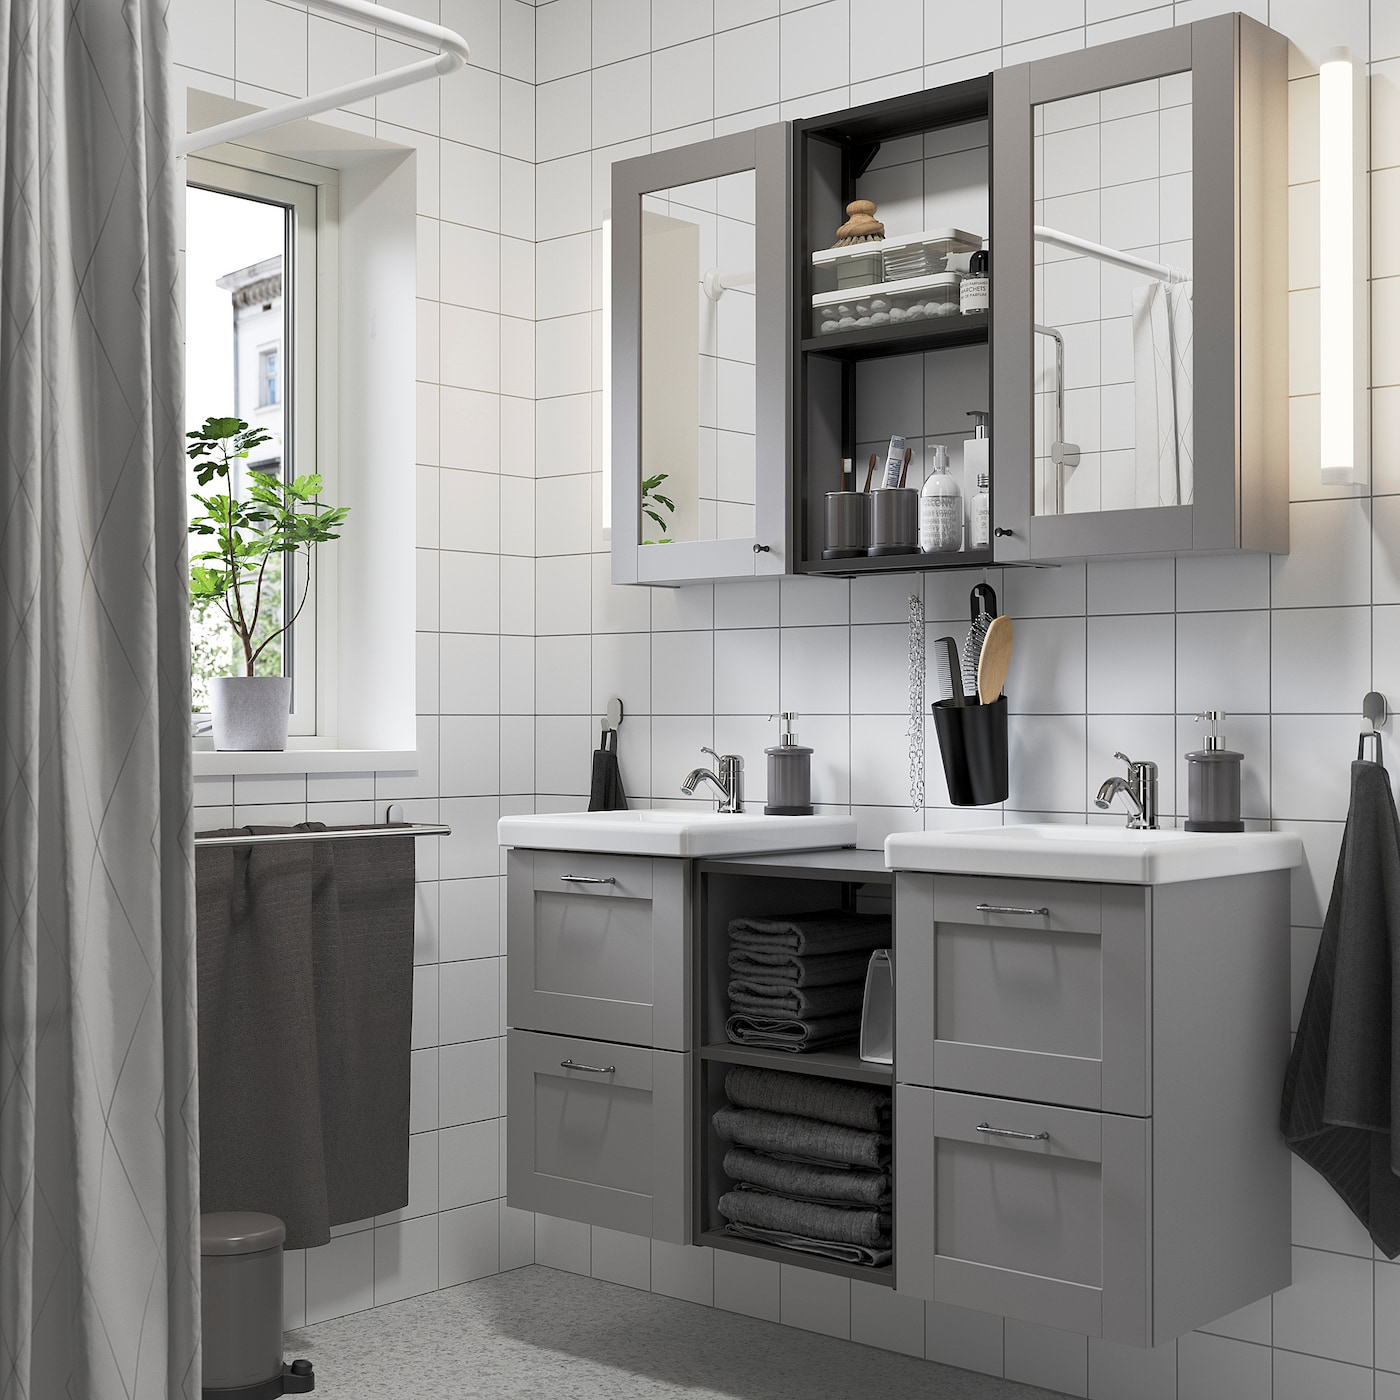 ENHET / TVÄLLEN Bathroom furniture, set of 22, grey frame/anthracite Lillsvan tap, 124x43x65 cm